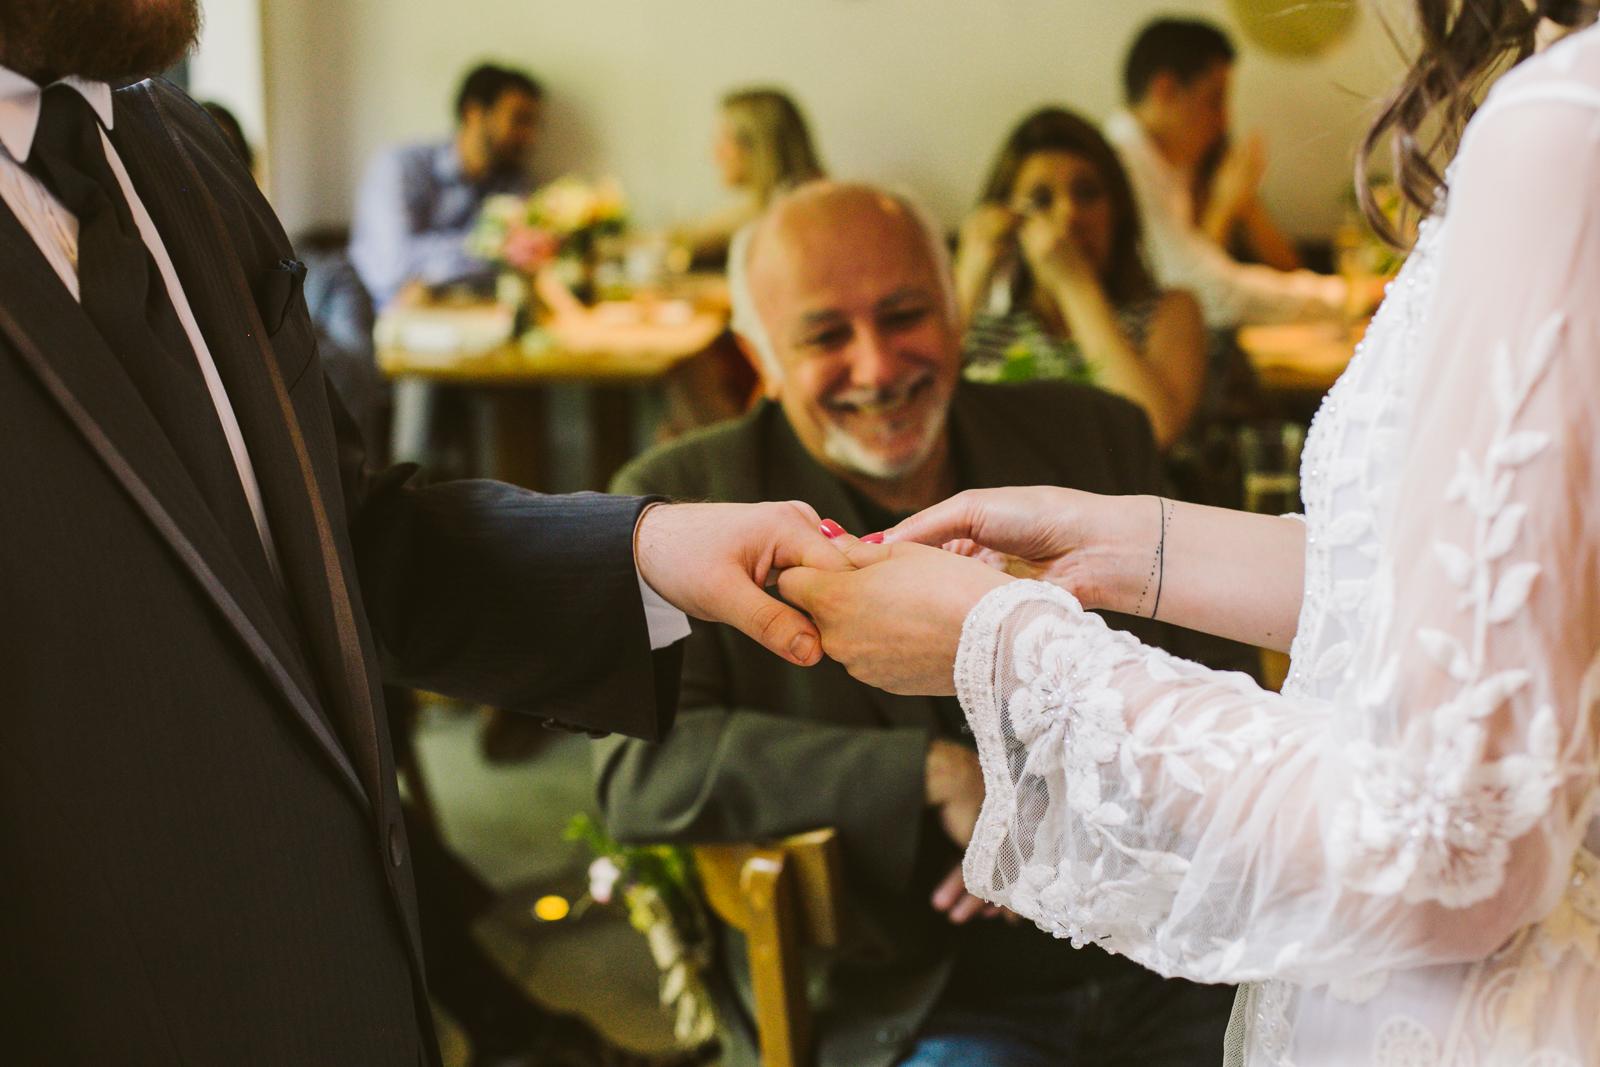 Casamento simples mostra que o amor é o que conta 7